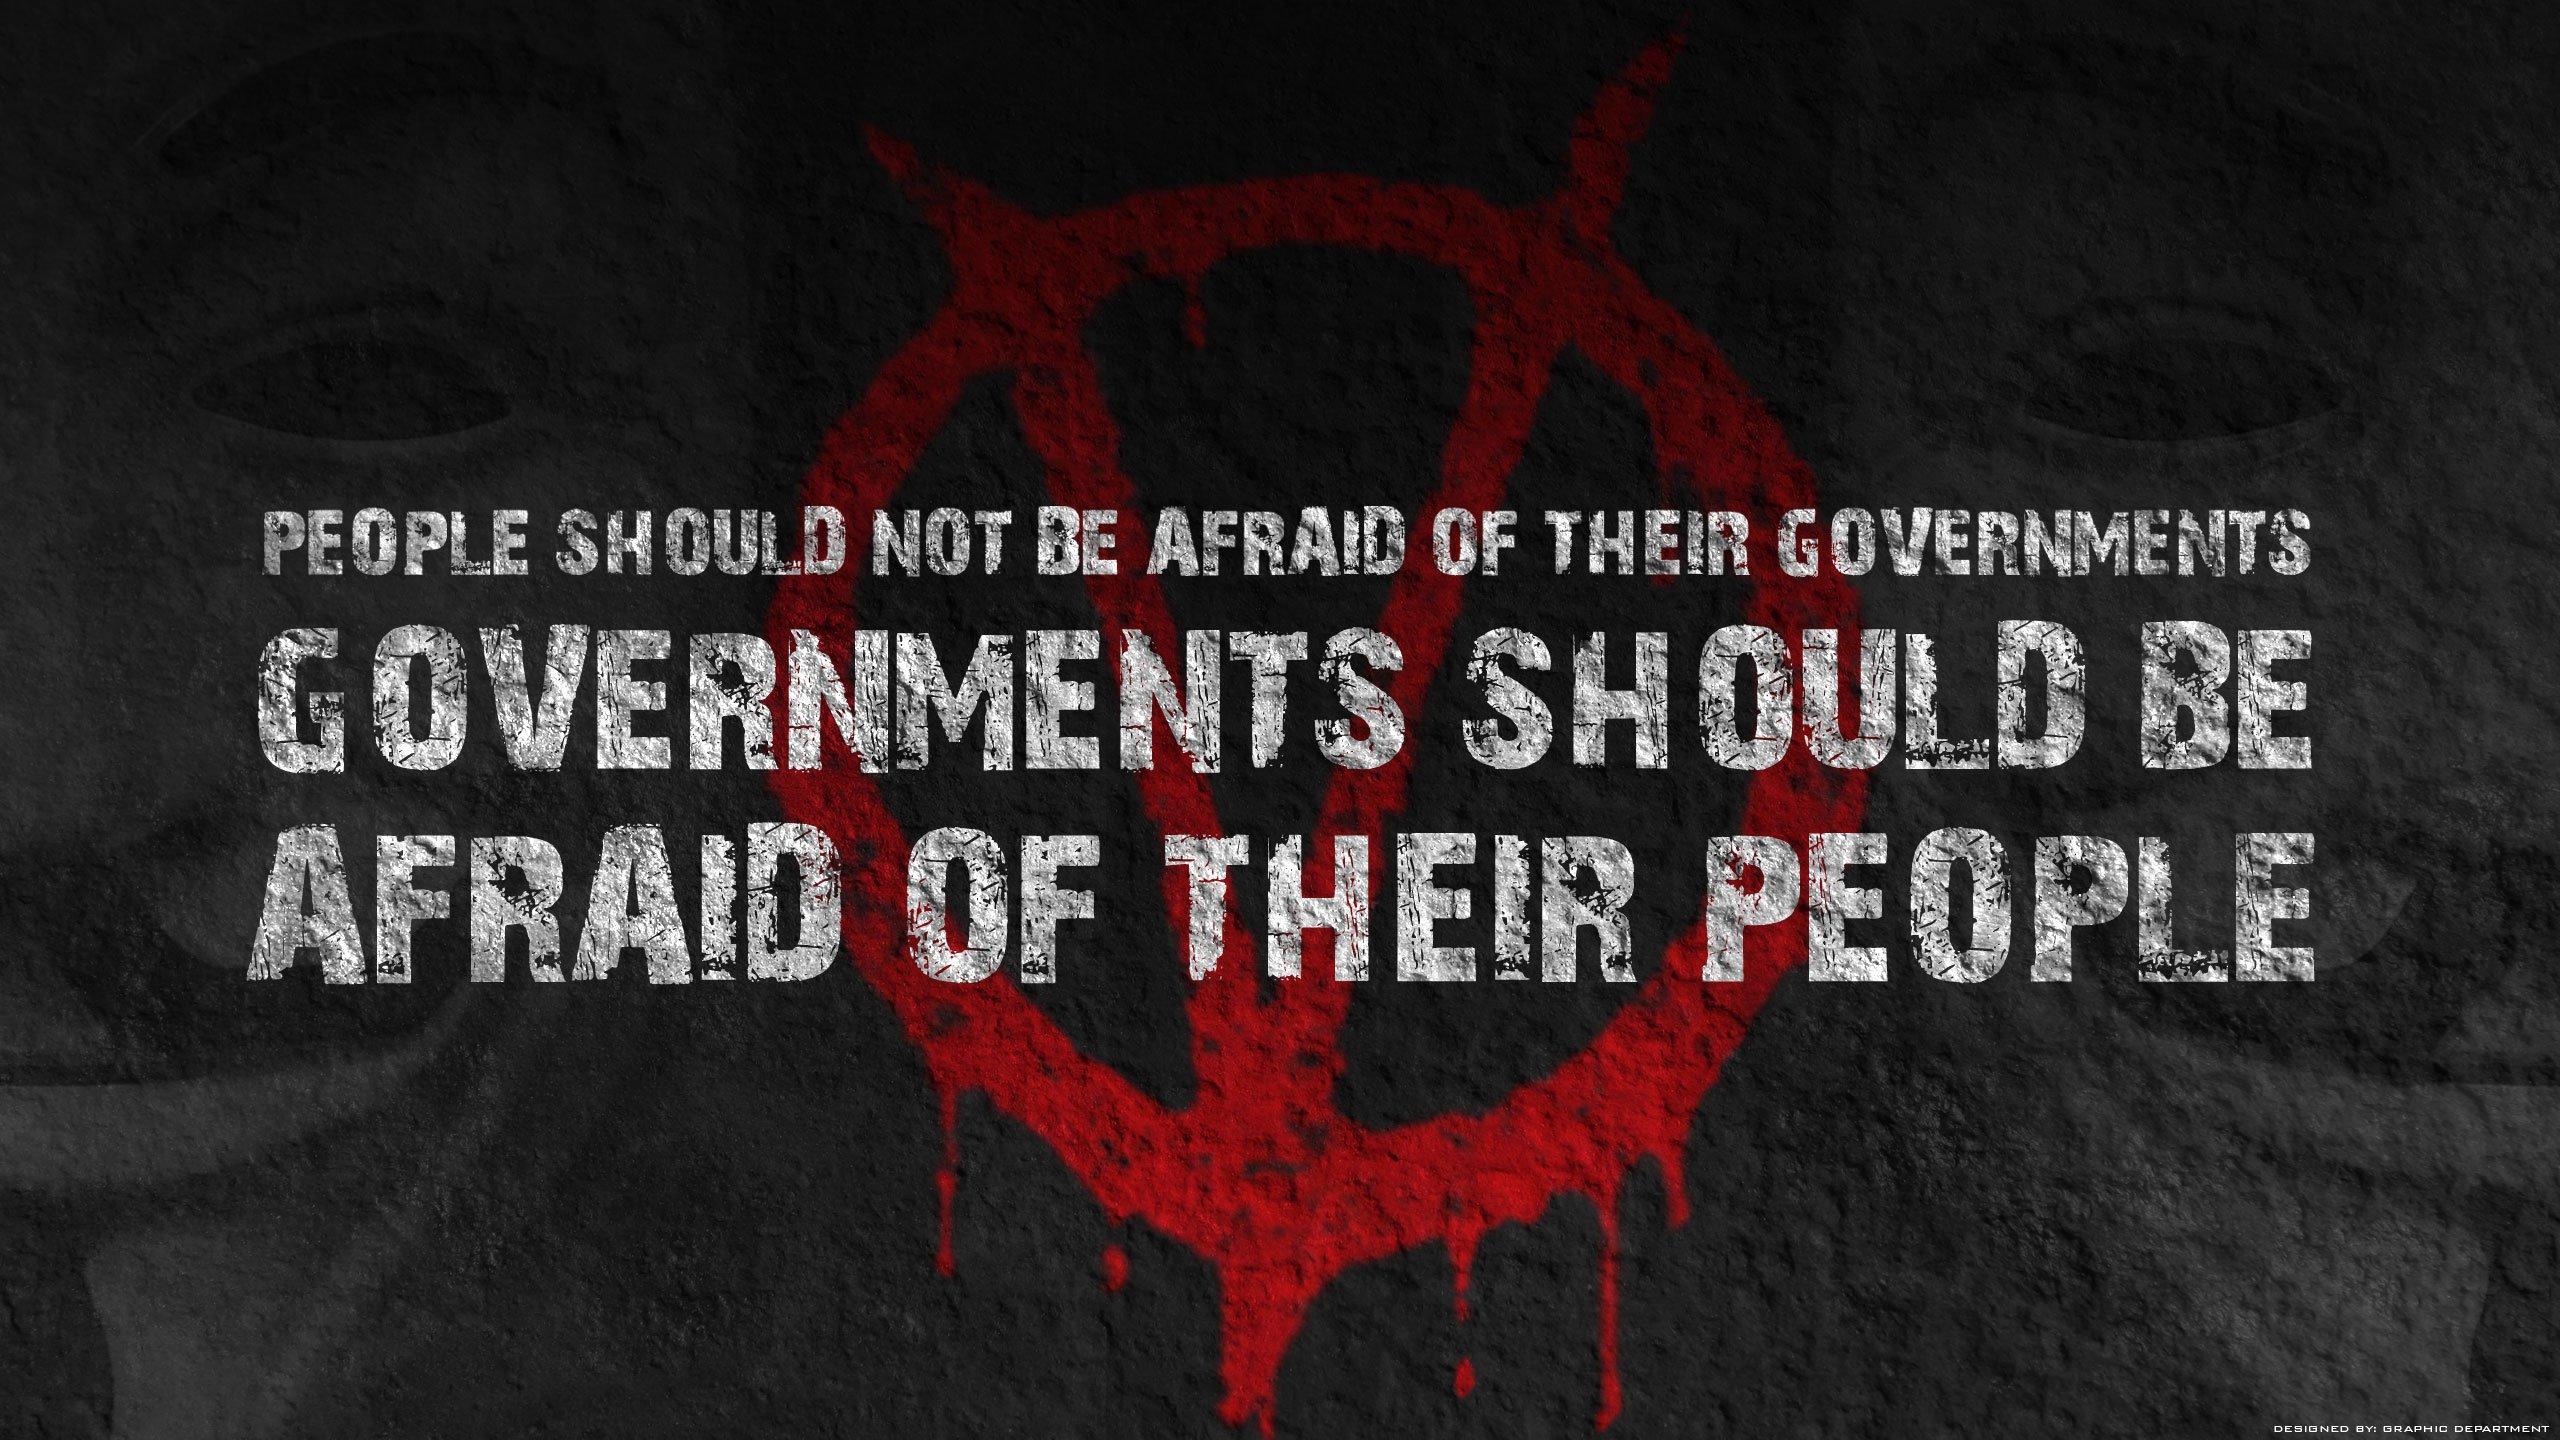 Anonymous Mask Sadic Dark Anarchy Hacker Hacking Vendetta Wallpaper 2560x1440 455564 Wallpaperup